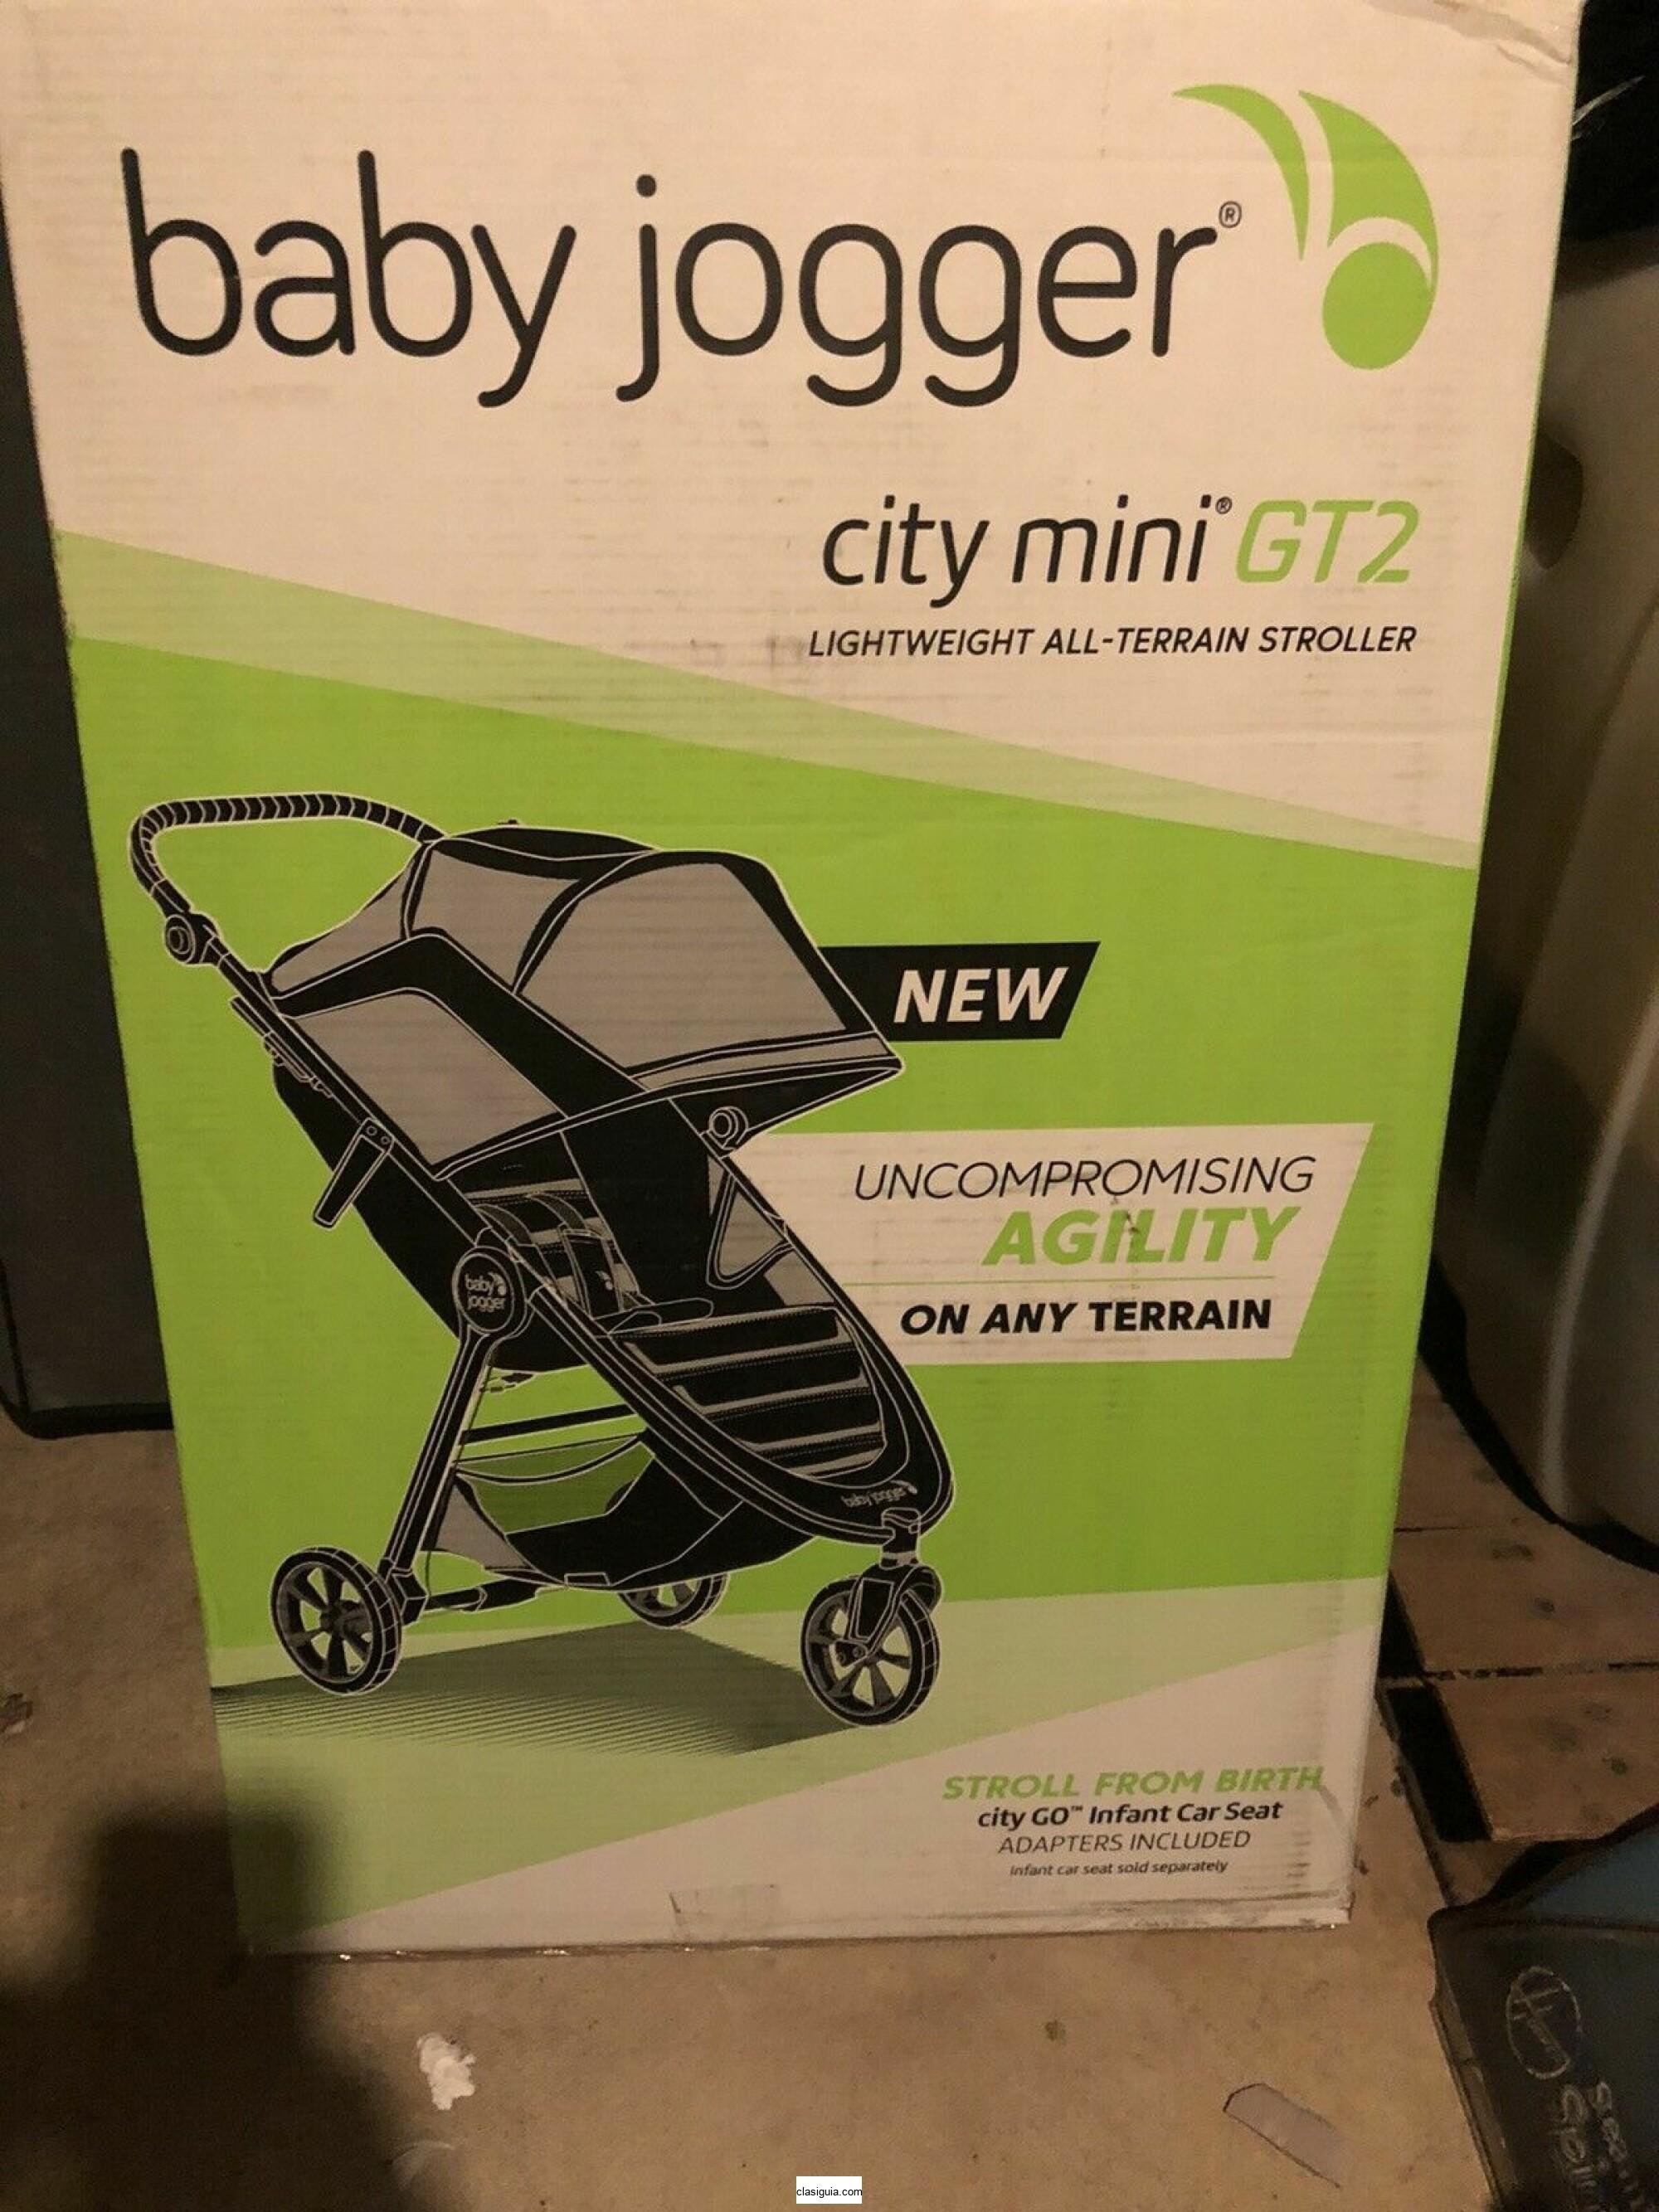 Baby jogger gt2 single